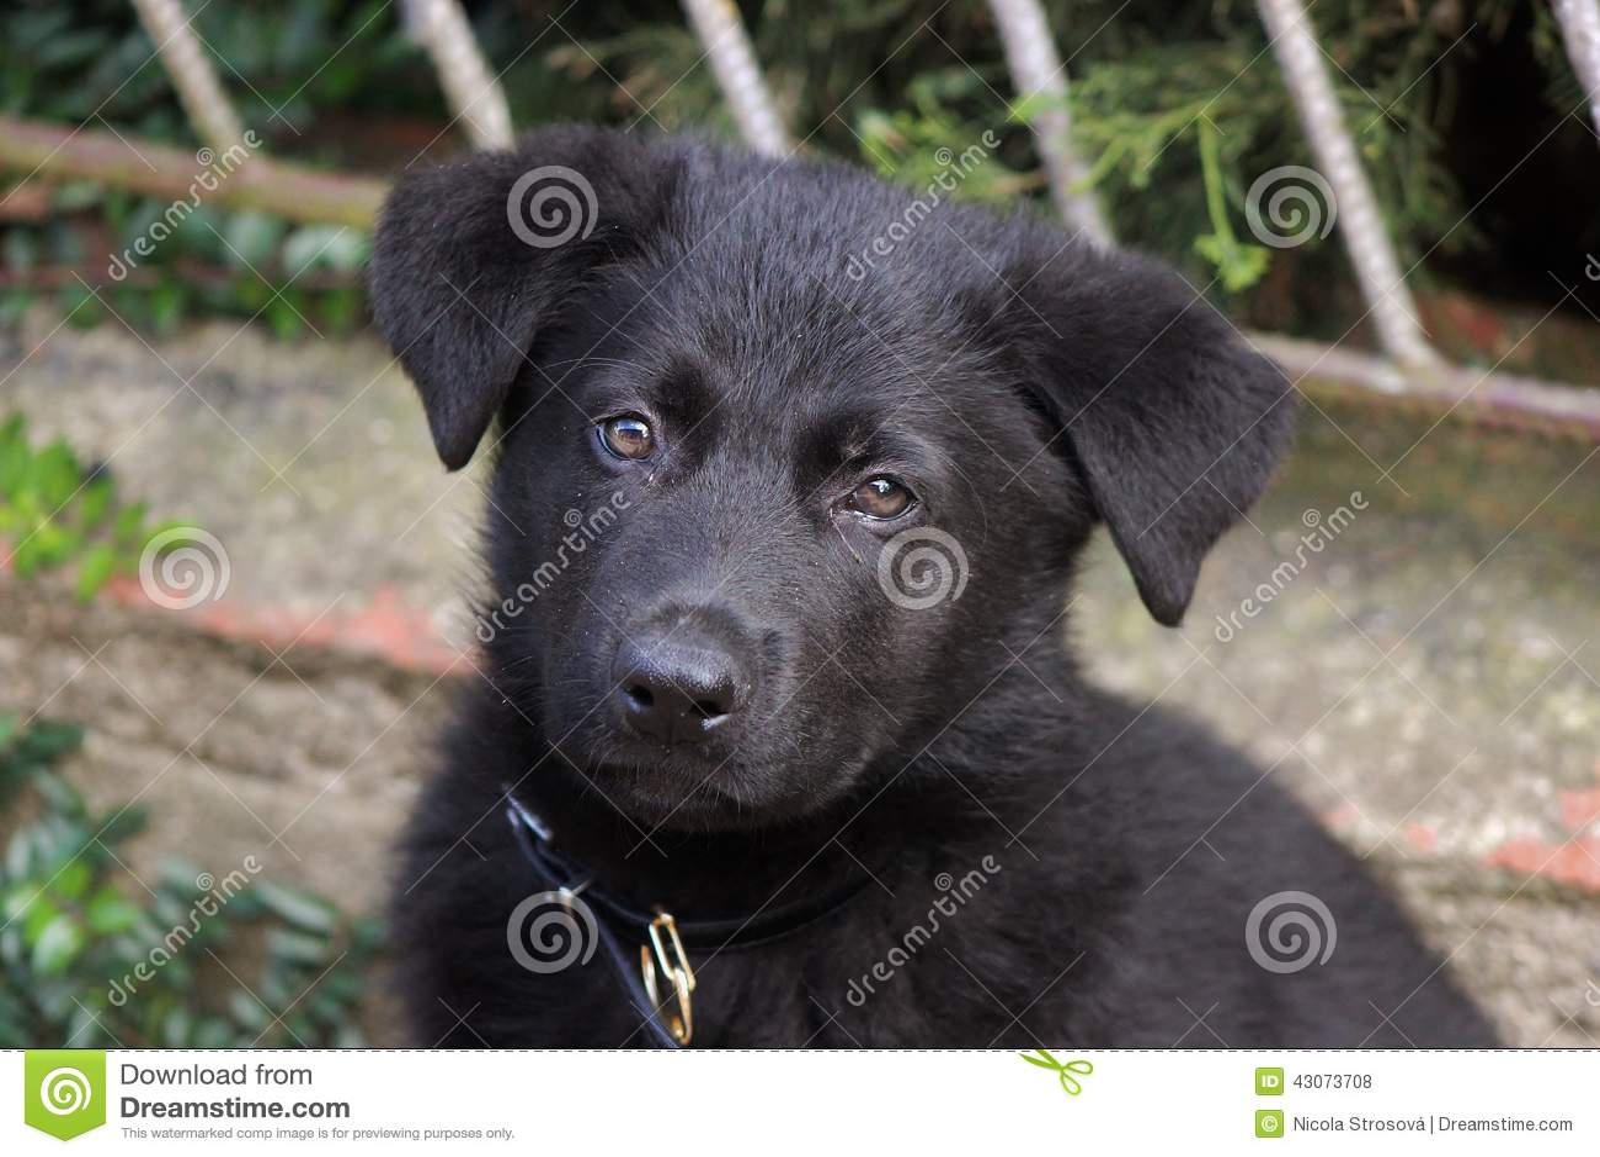 Black German Shepherd Puppy Stock Photo Image Of Shepherd Grass 43073708